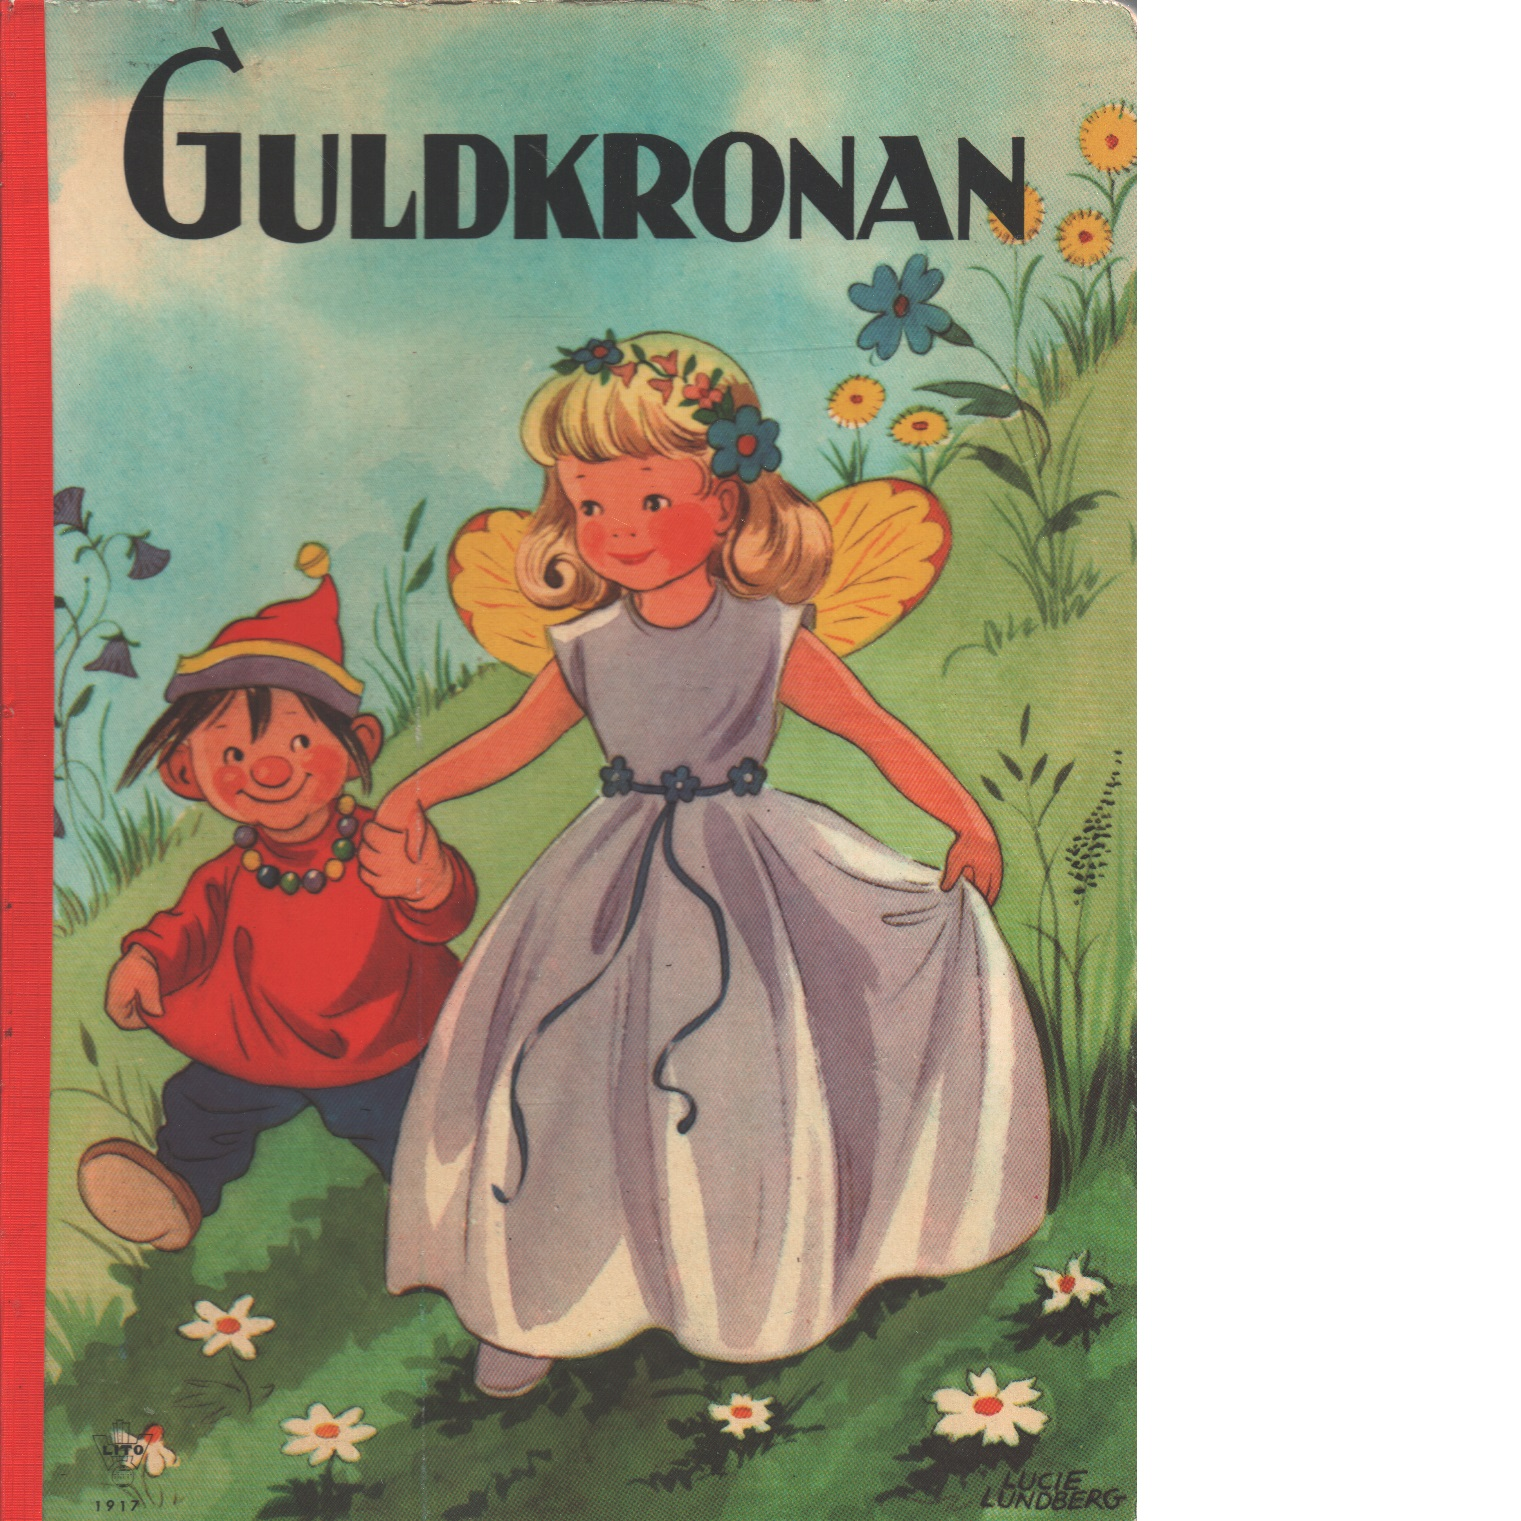 Guldkronan - Berthelius, Jenny